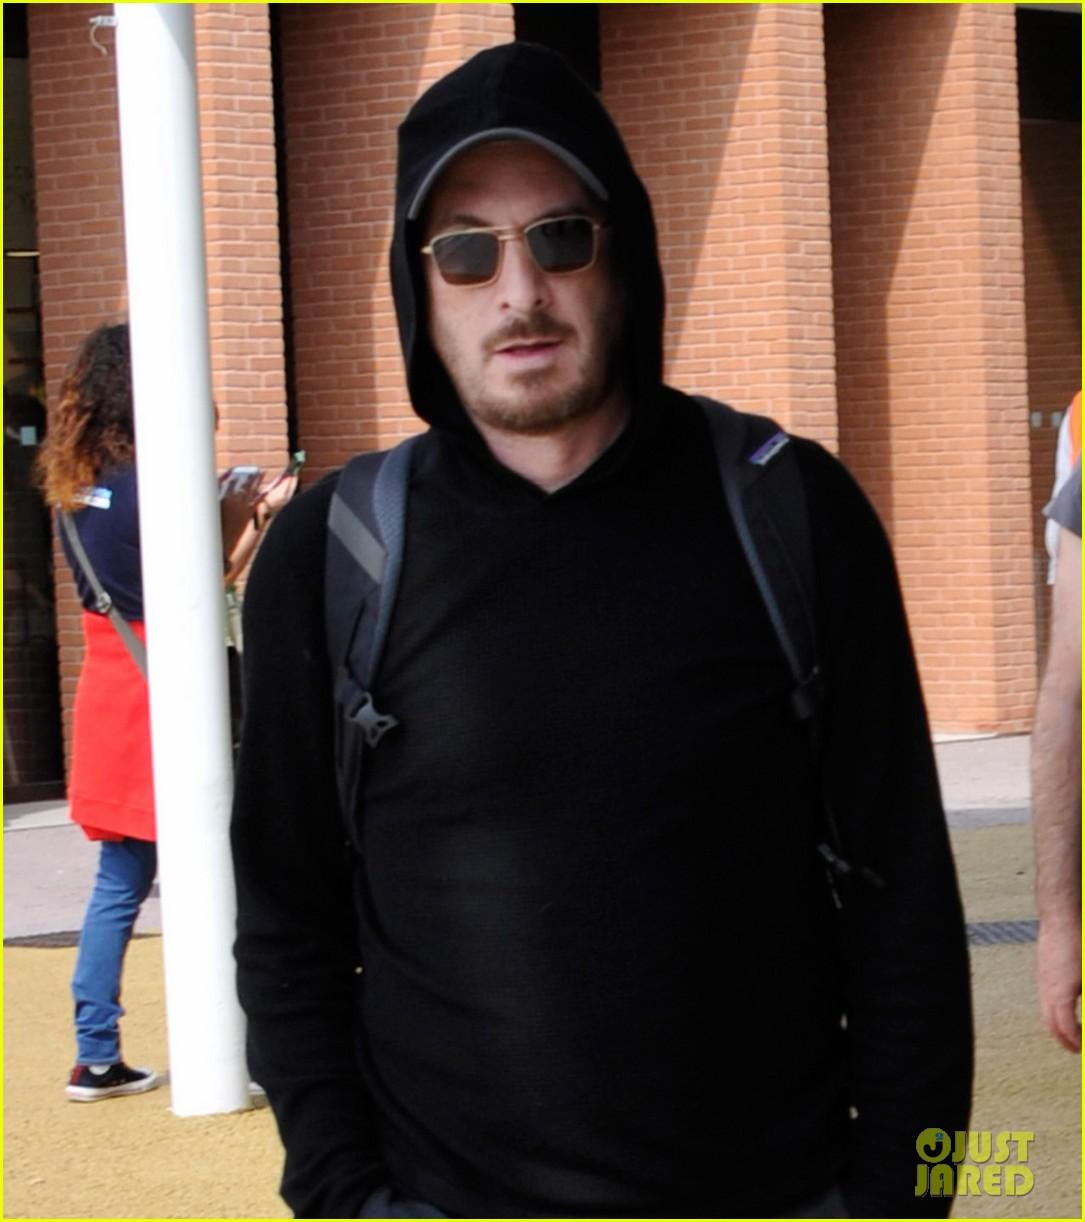 jennifer lawrence arrives for venice film festival with darren aronofsky 023949460